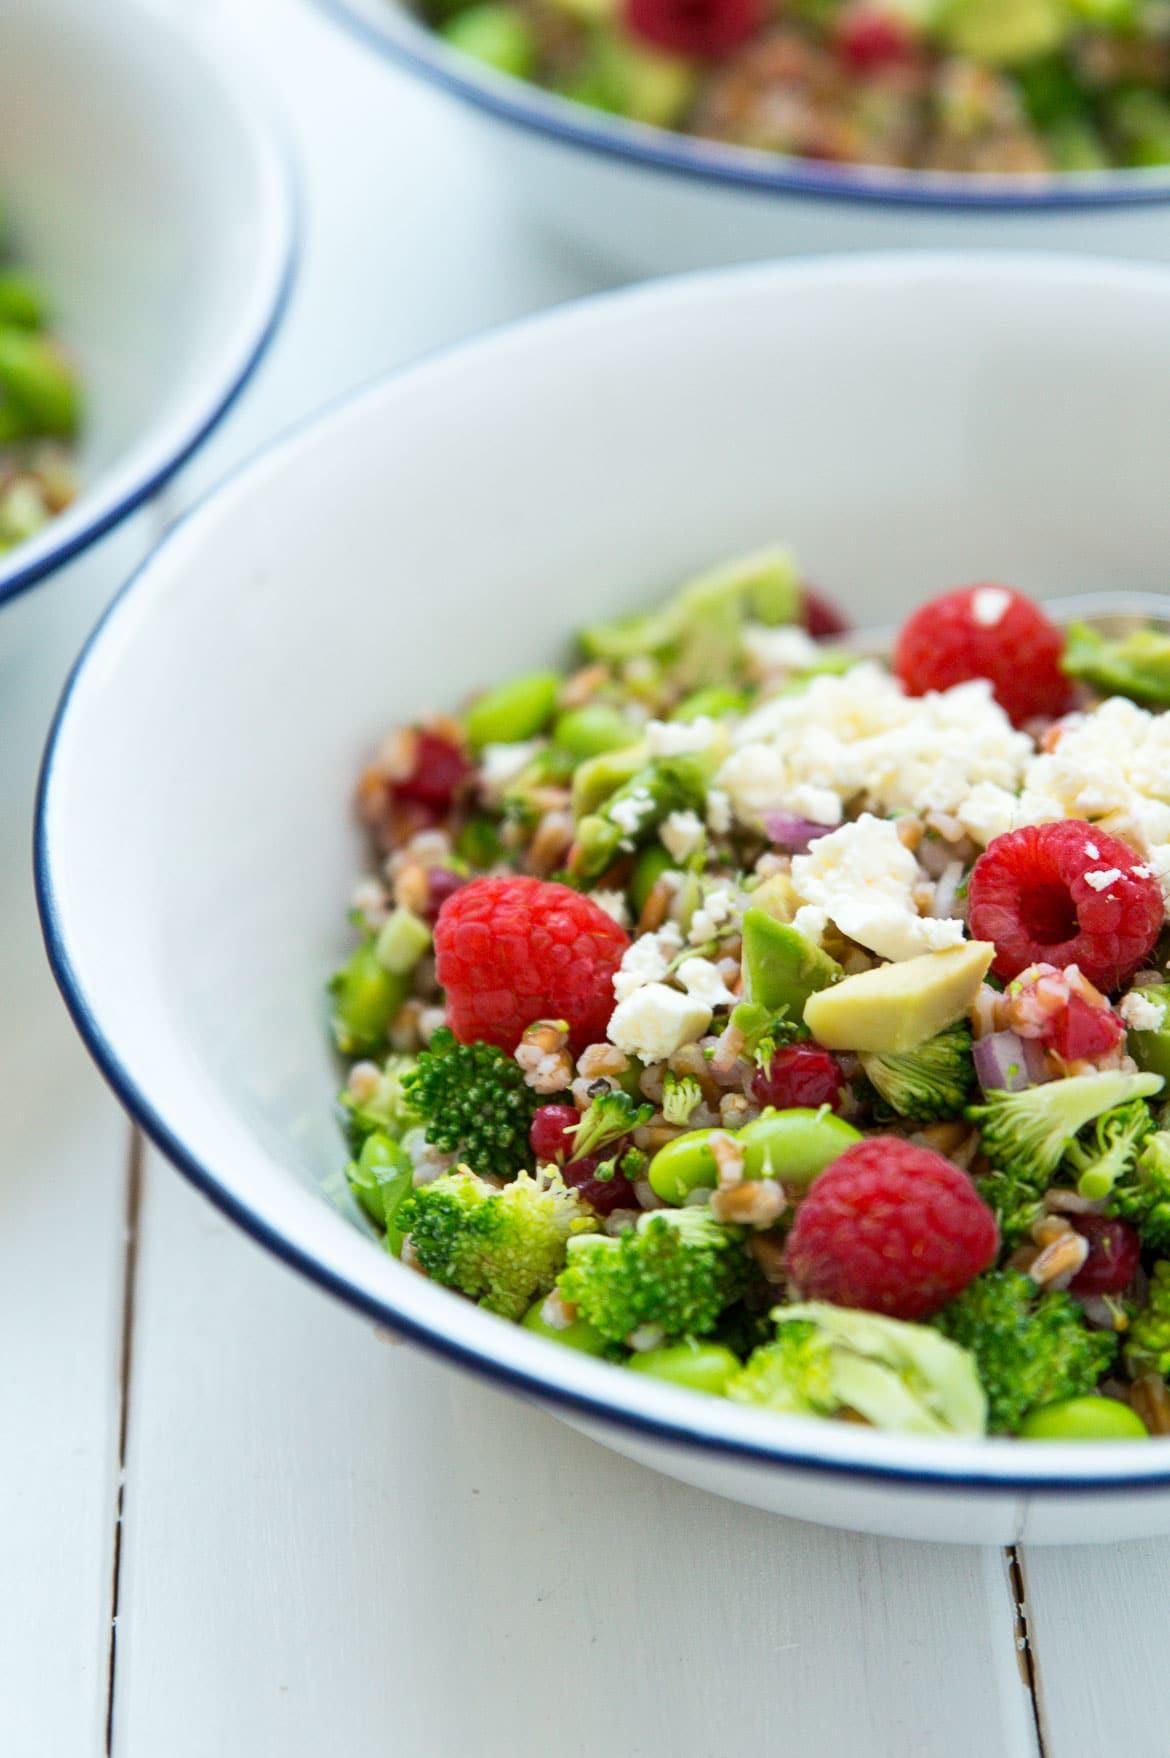 Broccolisalat med edamamebønner, bær, avocado og feta